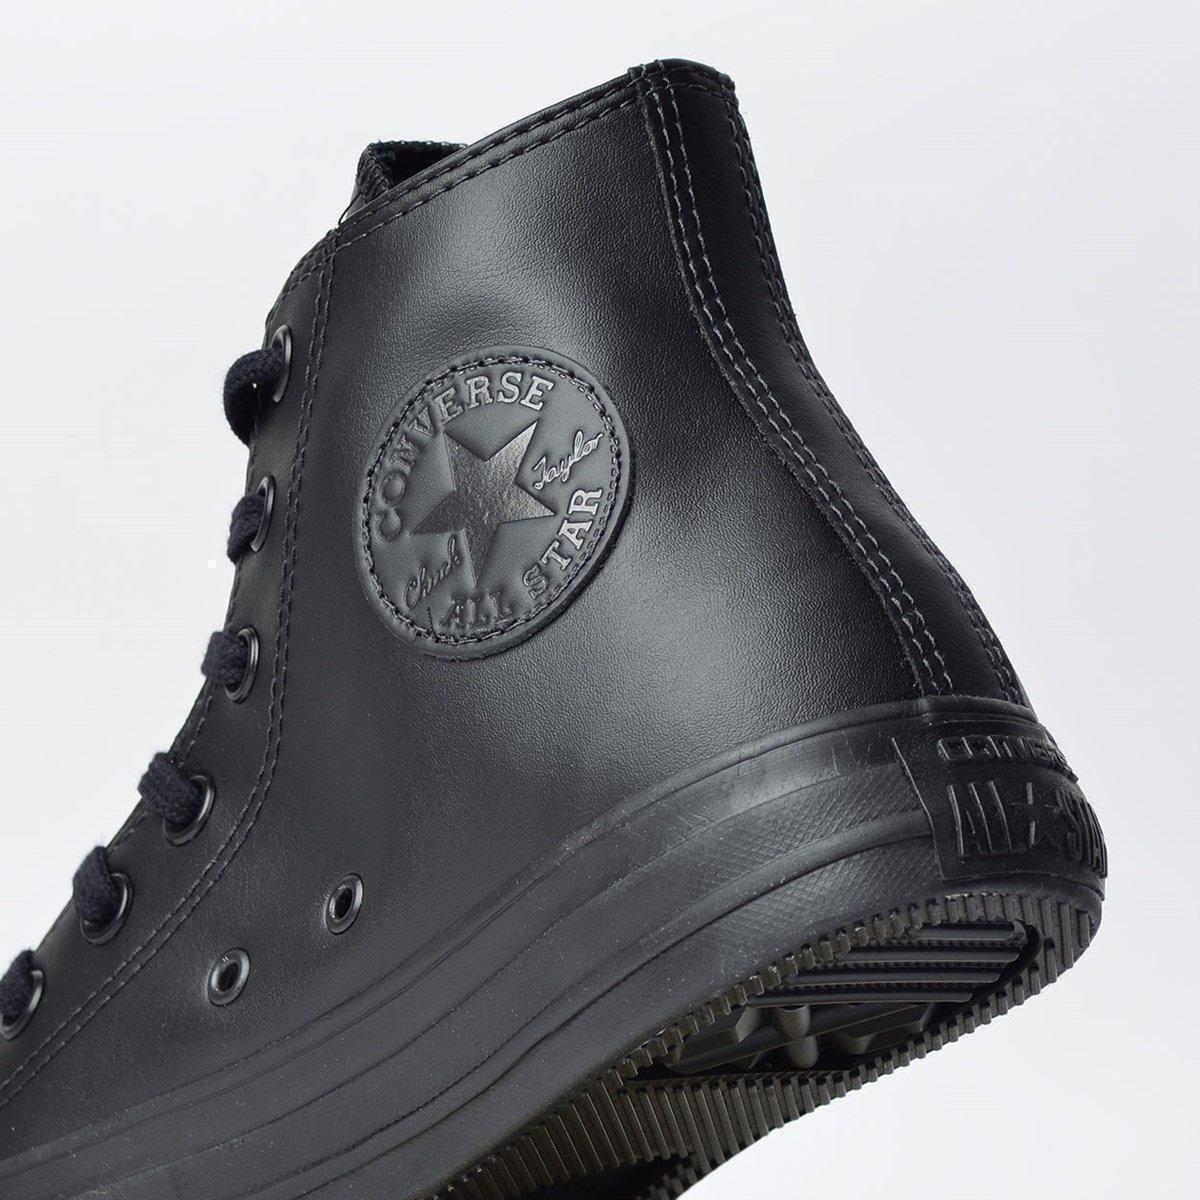 dc1785e98f9 Tênis Converse Chuck Taylor All Star Monochrome Leather Hi - Compre ...